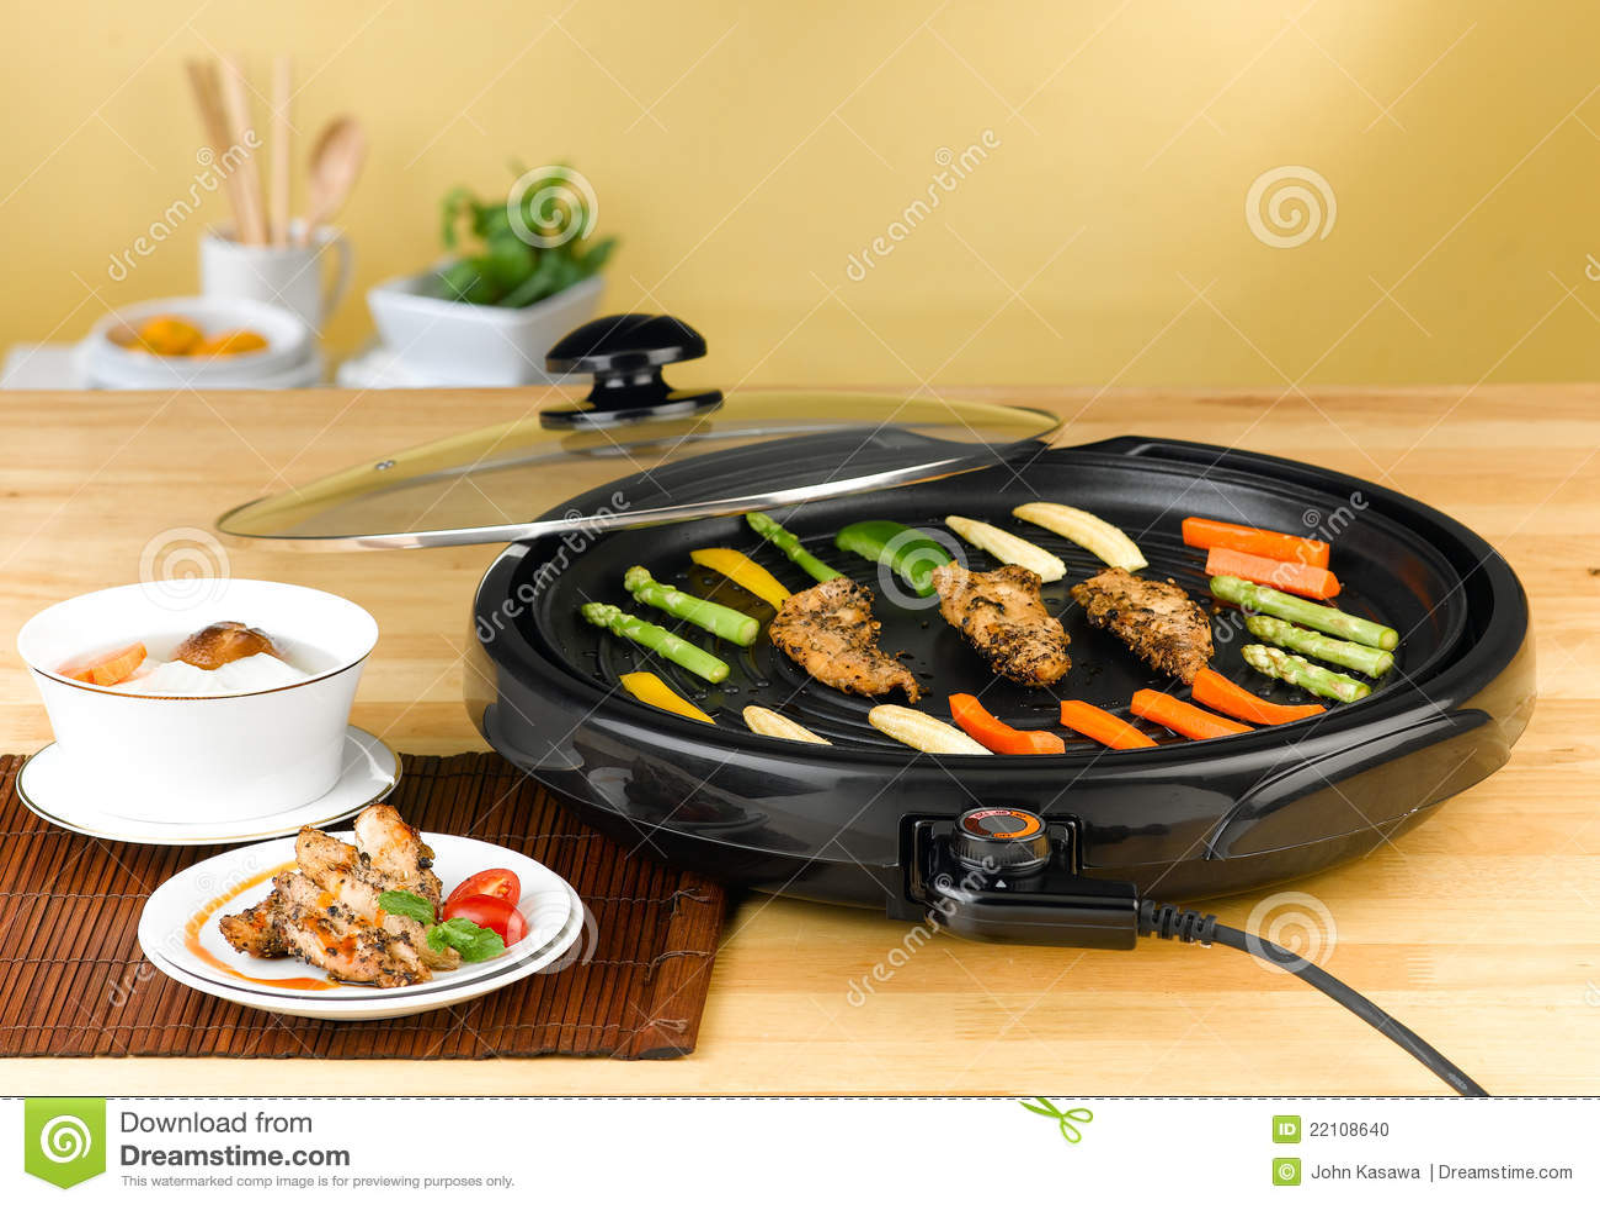 Poele Electrique De Barbecue Photo Stock Image Du Housewife